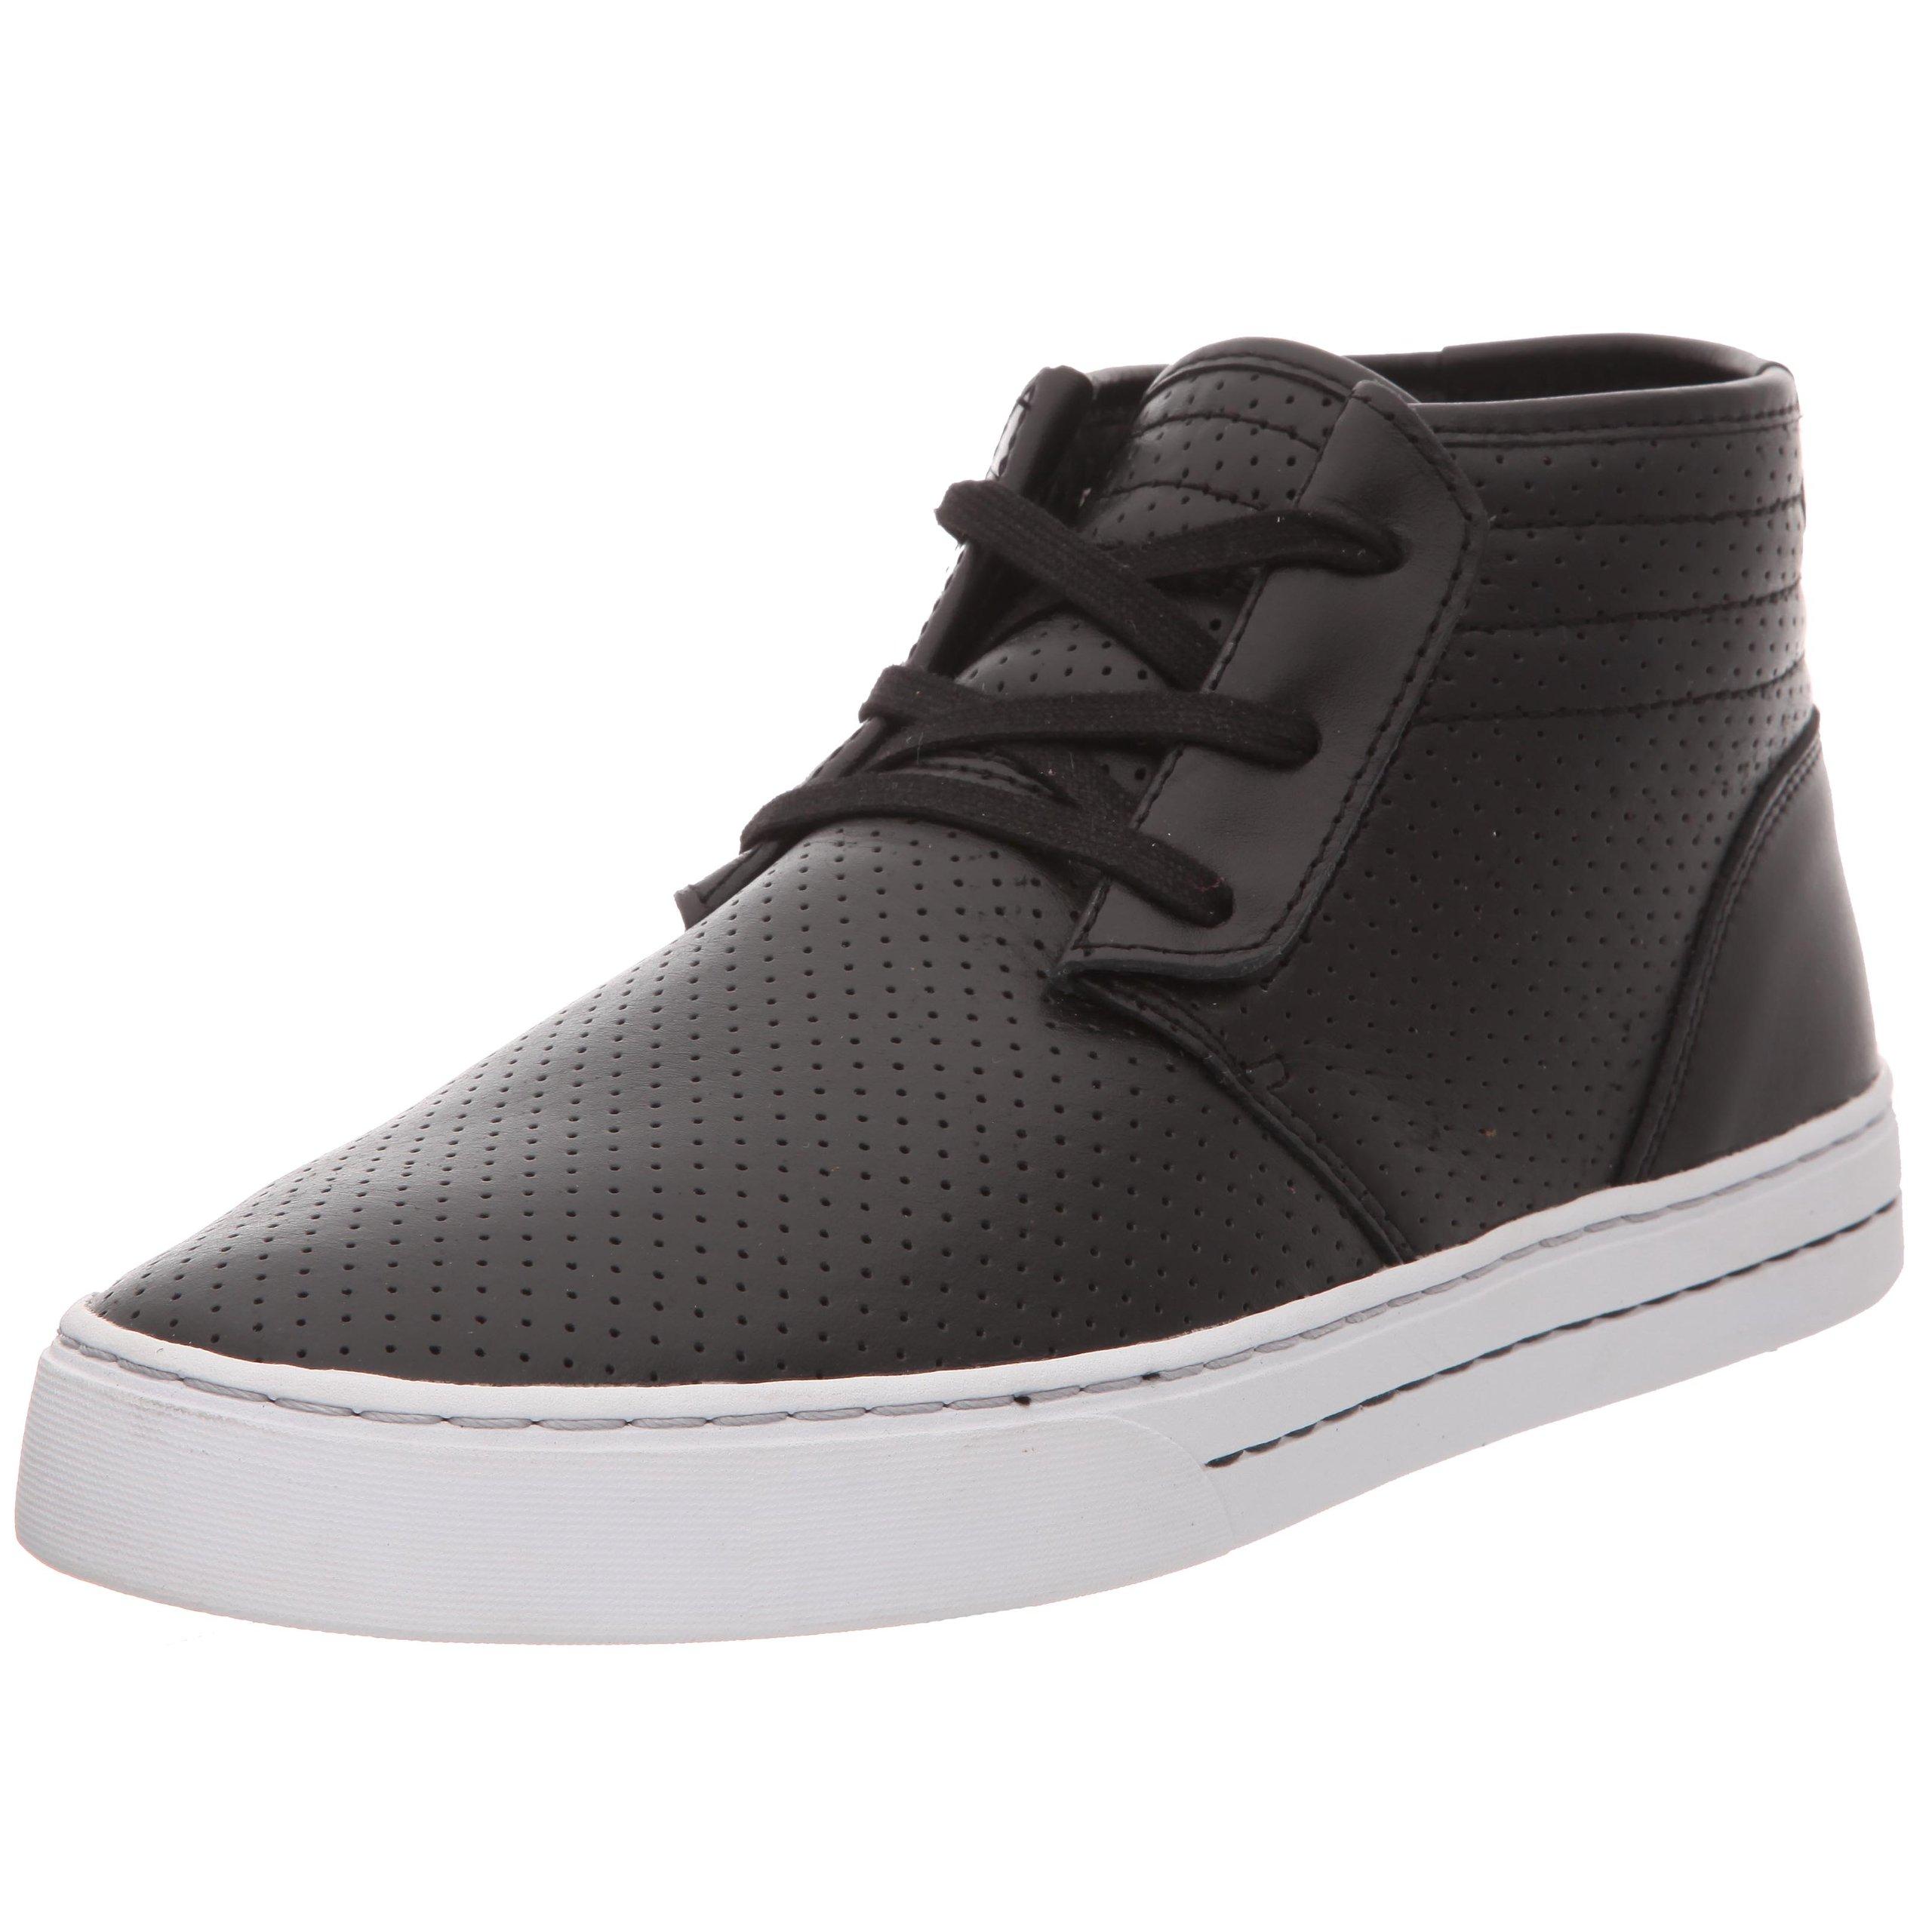 Scarpe casual da uomo (TG. 40 EU) Clae Sneaker Uomo, nero (nero), 40 EU (M3a)